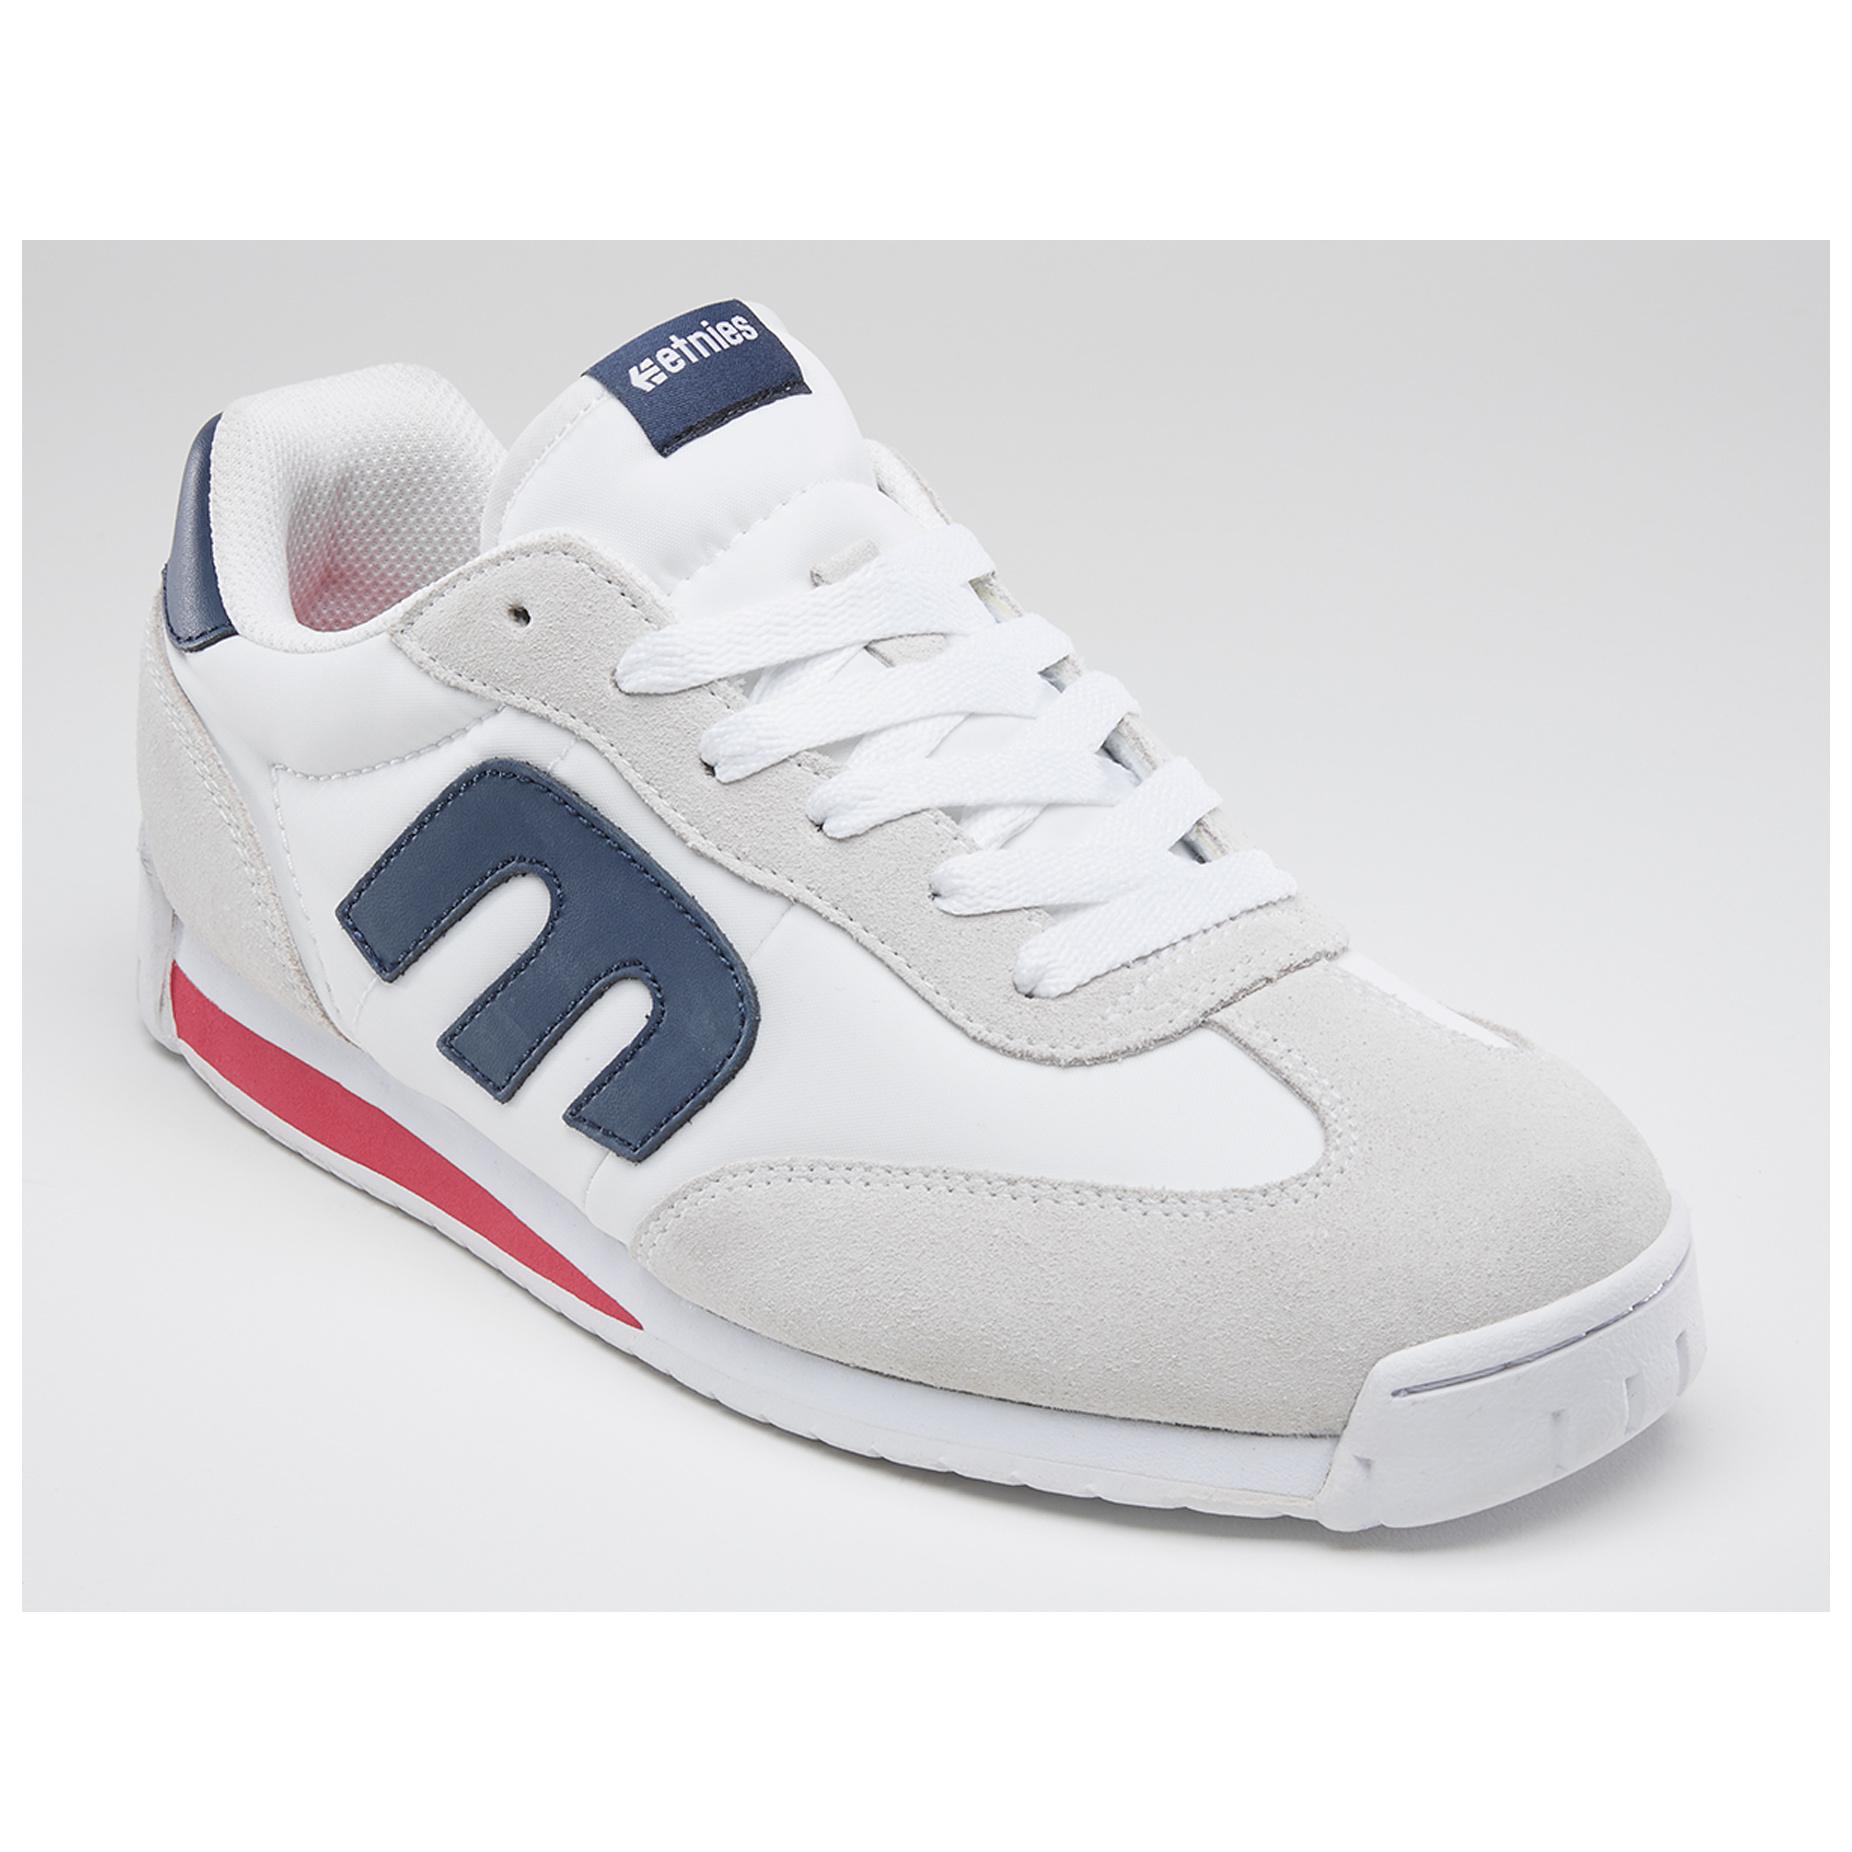 etnies Lo Cut CB Skate Shoe - White